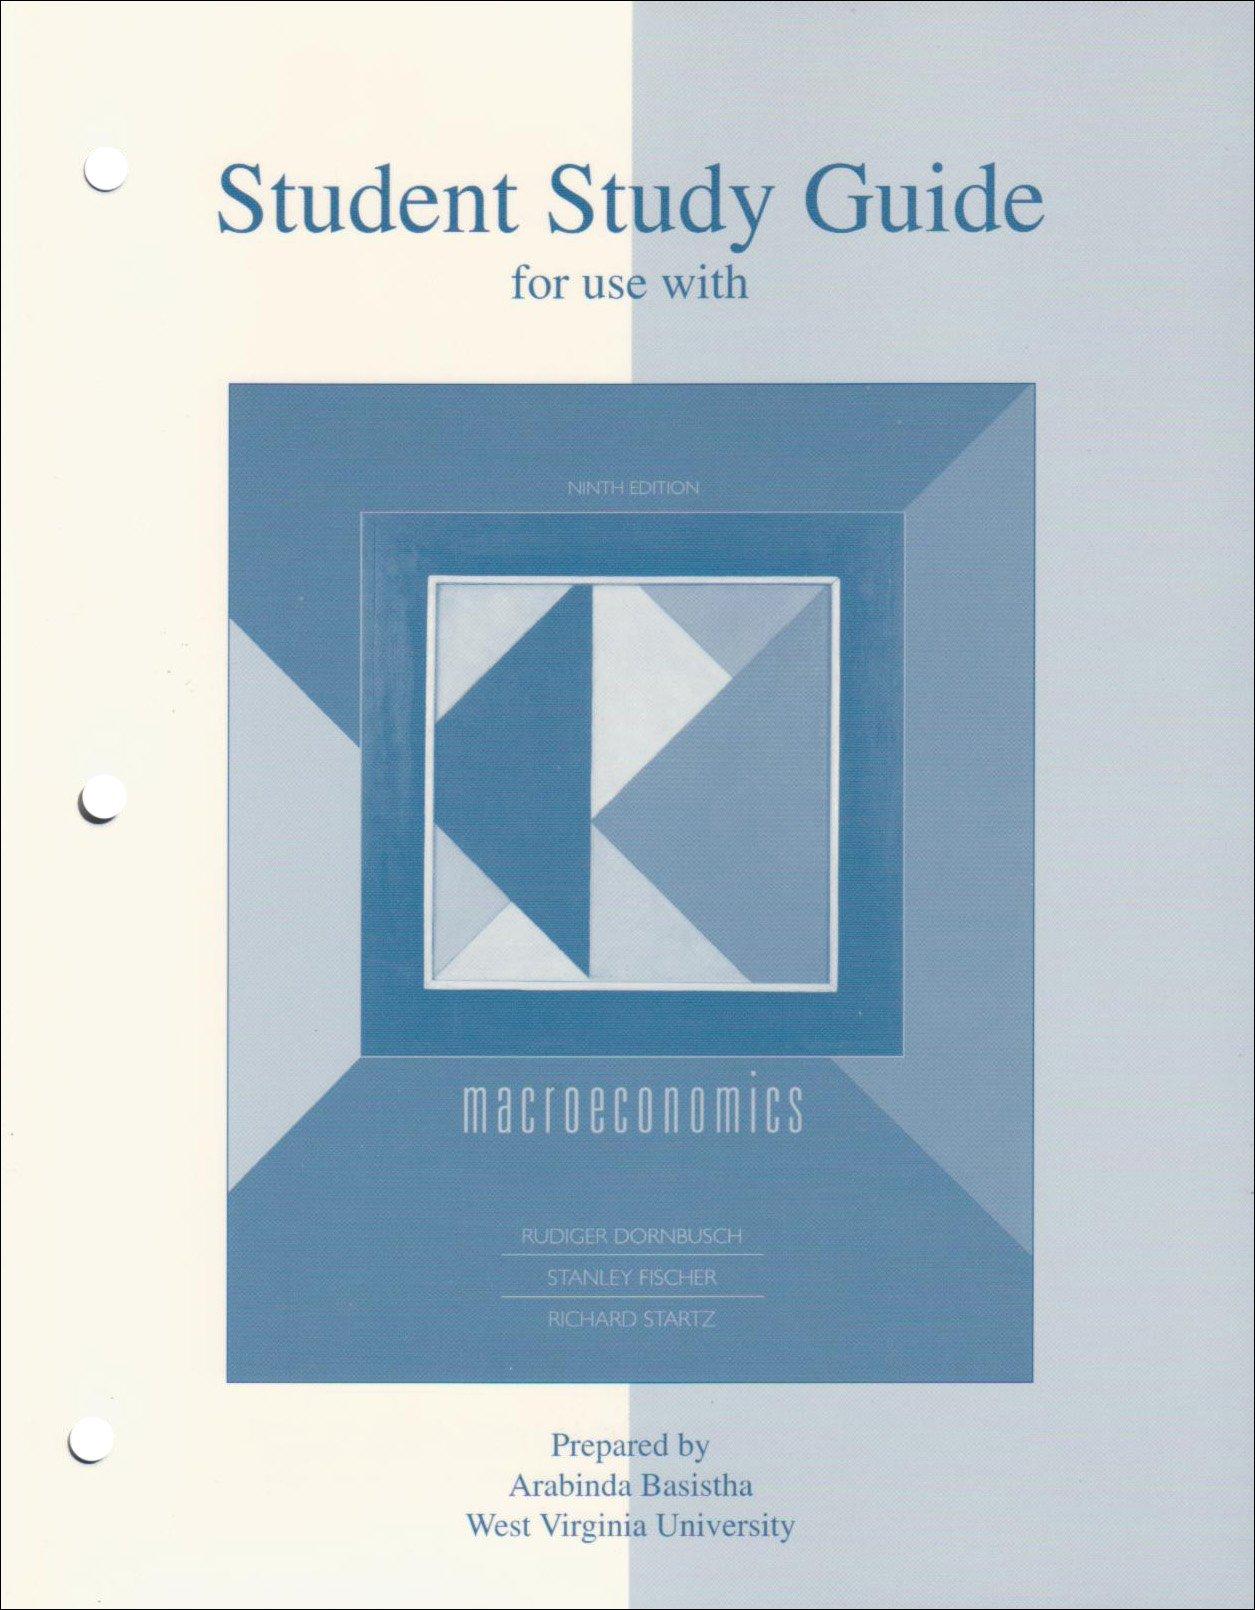 Student Study Guide t/a Macroeconomics 9e: R. Dornbusch, Stanley Fischer,  Richard Startz: 9780072981827: Books - Amazon.ca